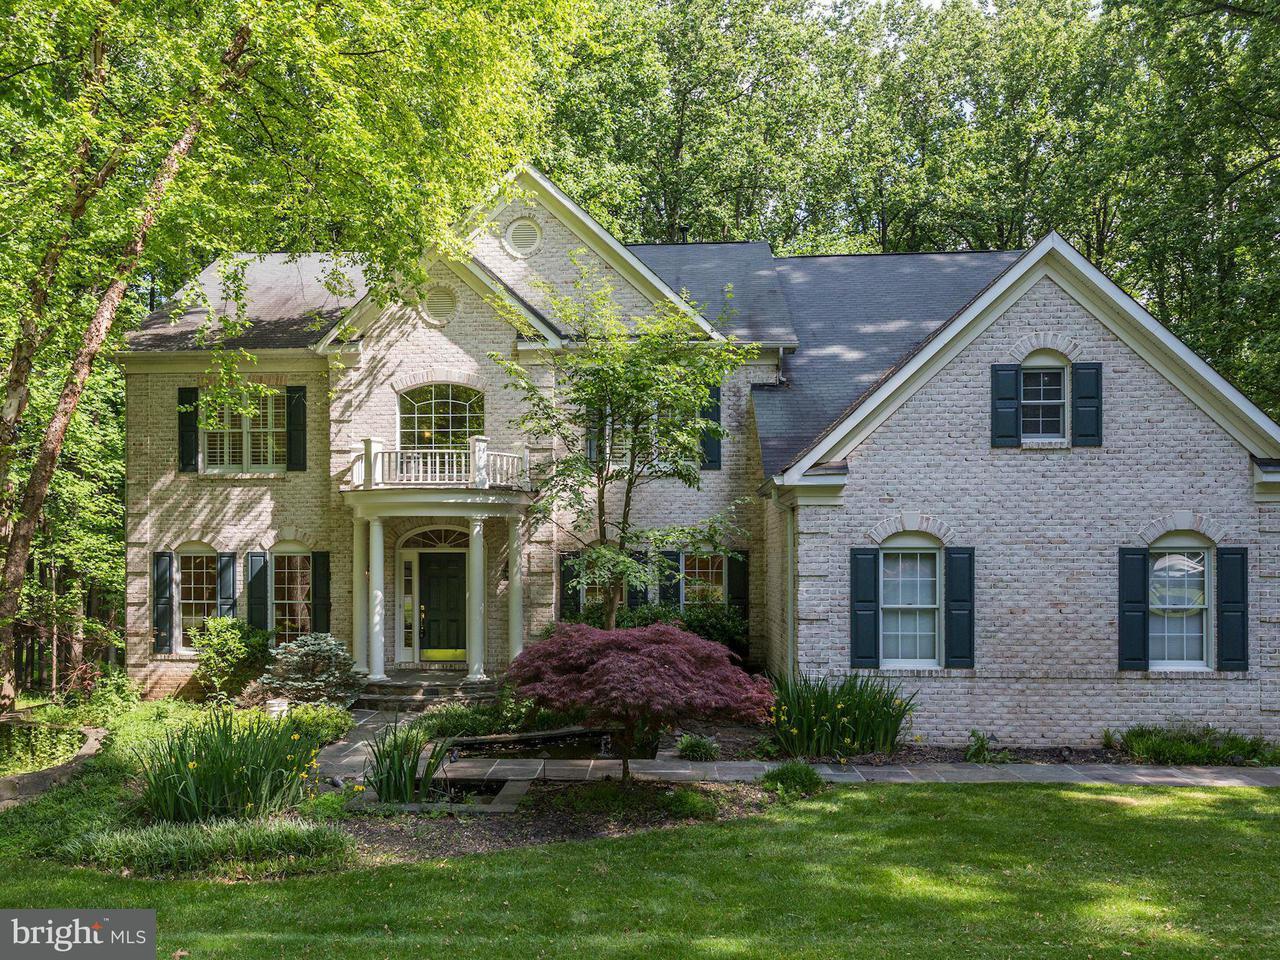 Single Family Home for Sale at 15205 ARMINIO Court 15205 ARMINIO Court Darnestown, Maryland 20874 United States